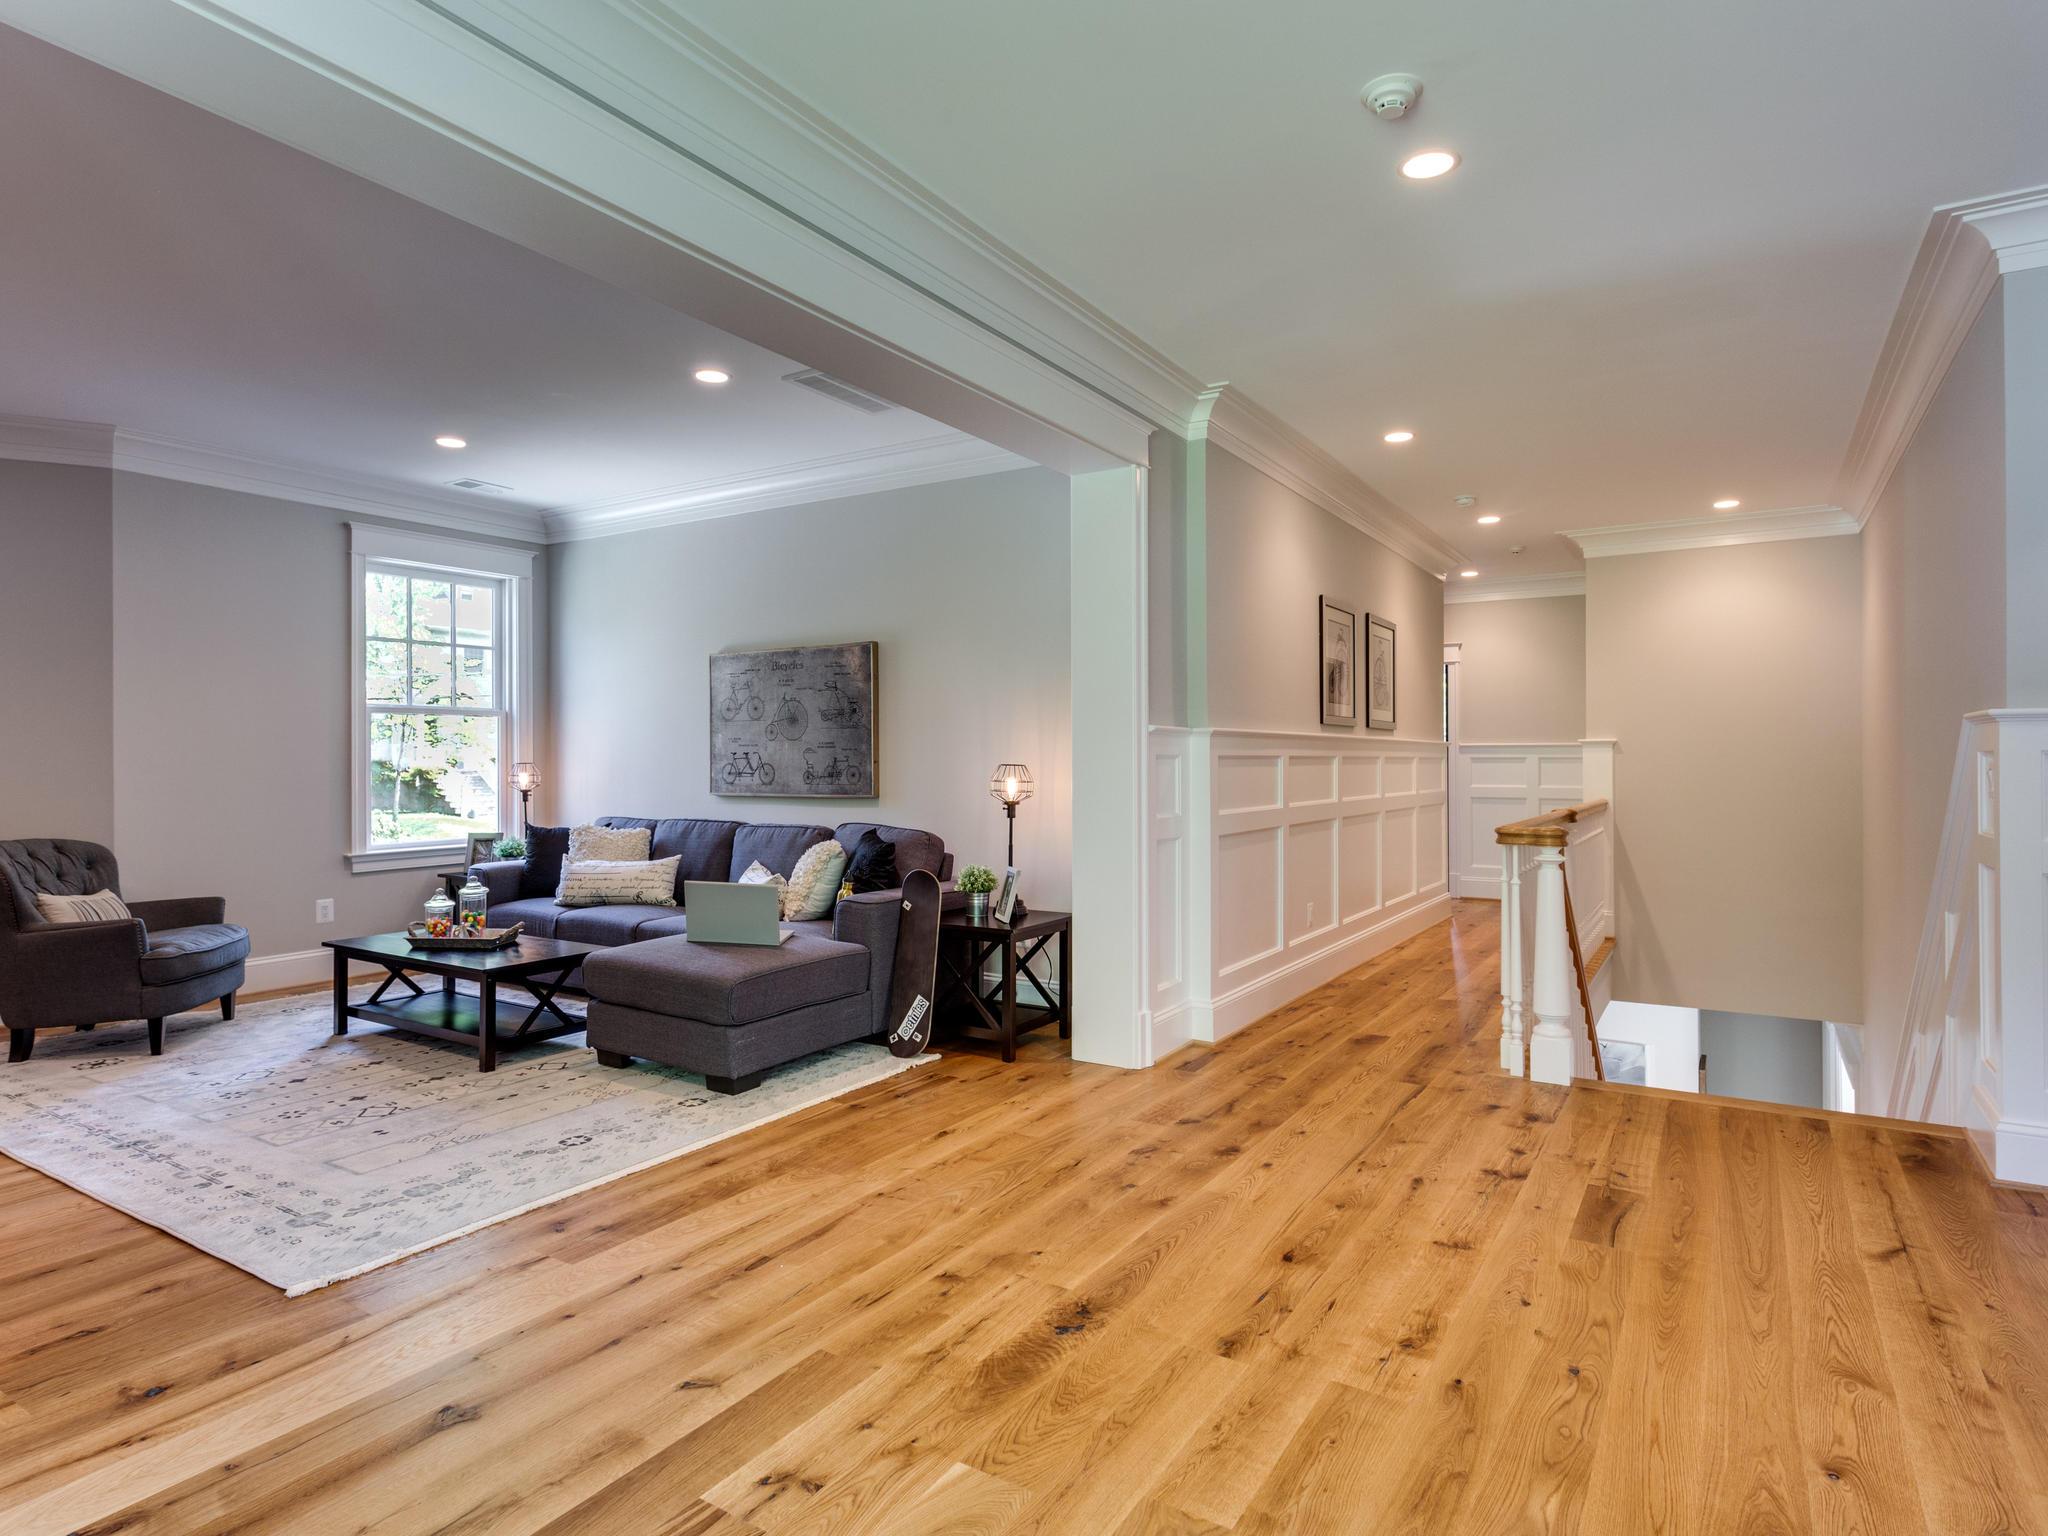 oak wood floor living room reading lamps live sawn white flooring cochran s lumber image of natural